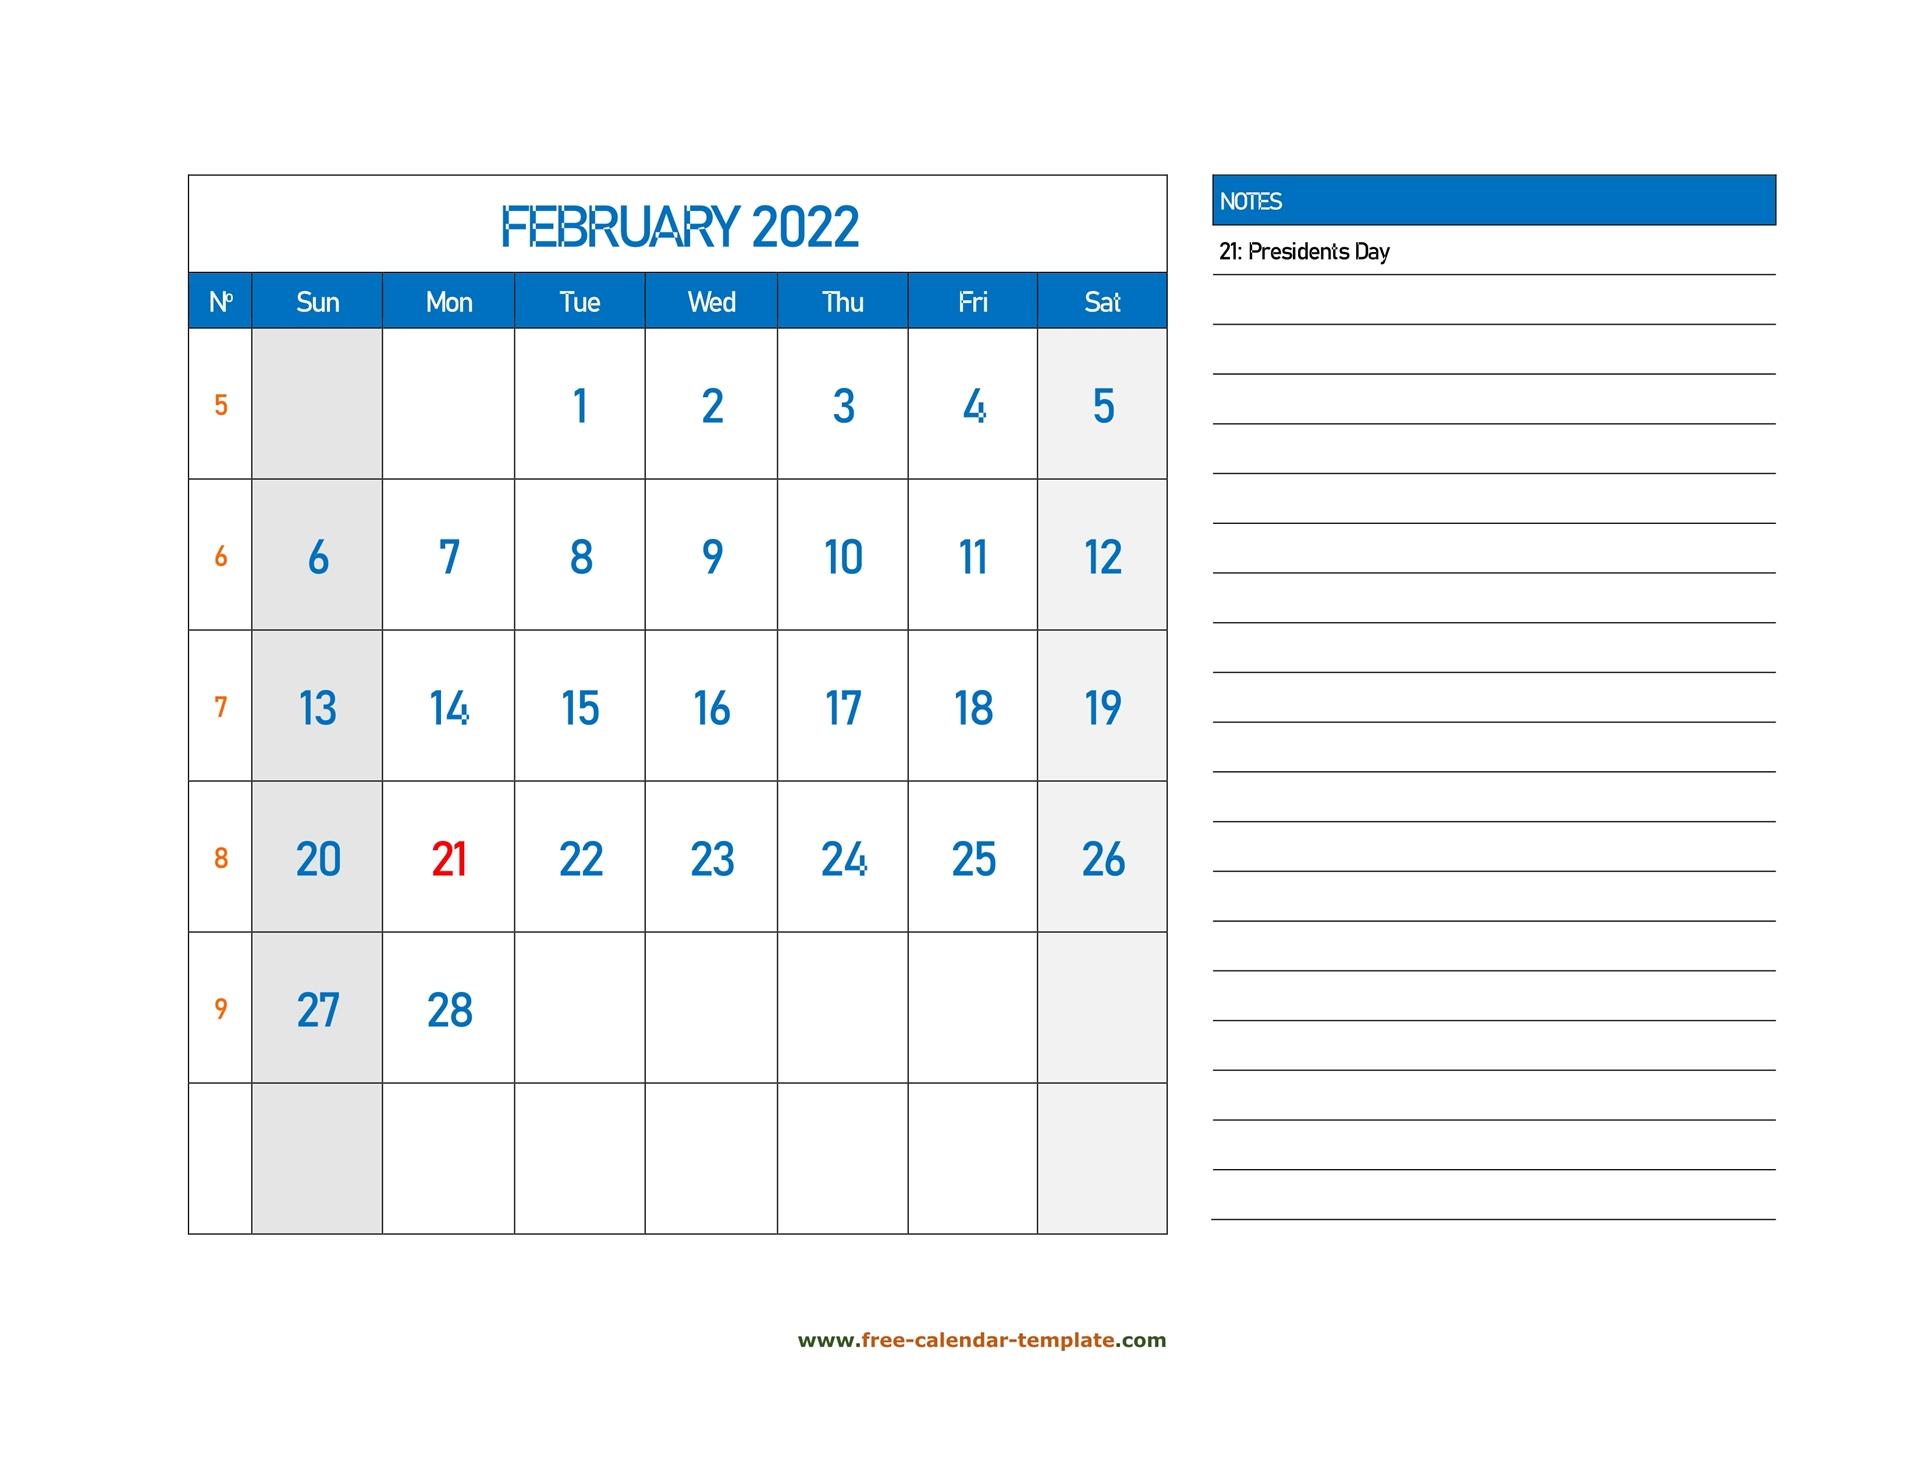 February 2022 Free Calendar Tempplate   Free Calendar Within 2022 Free Big Primt For Feb 2022